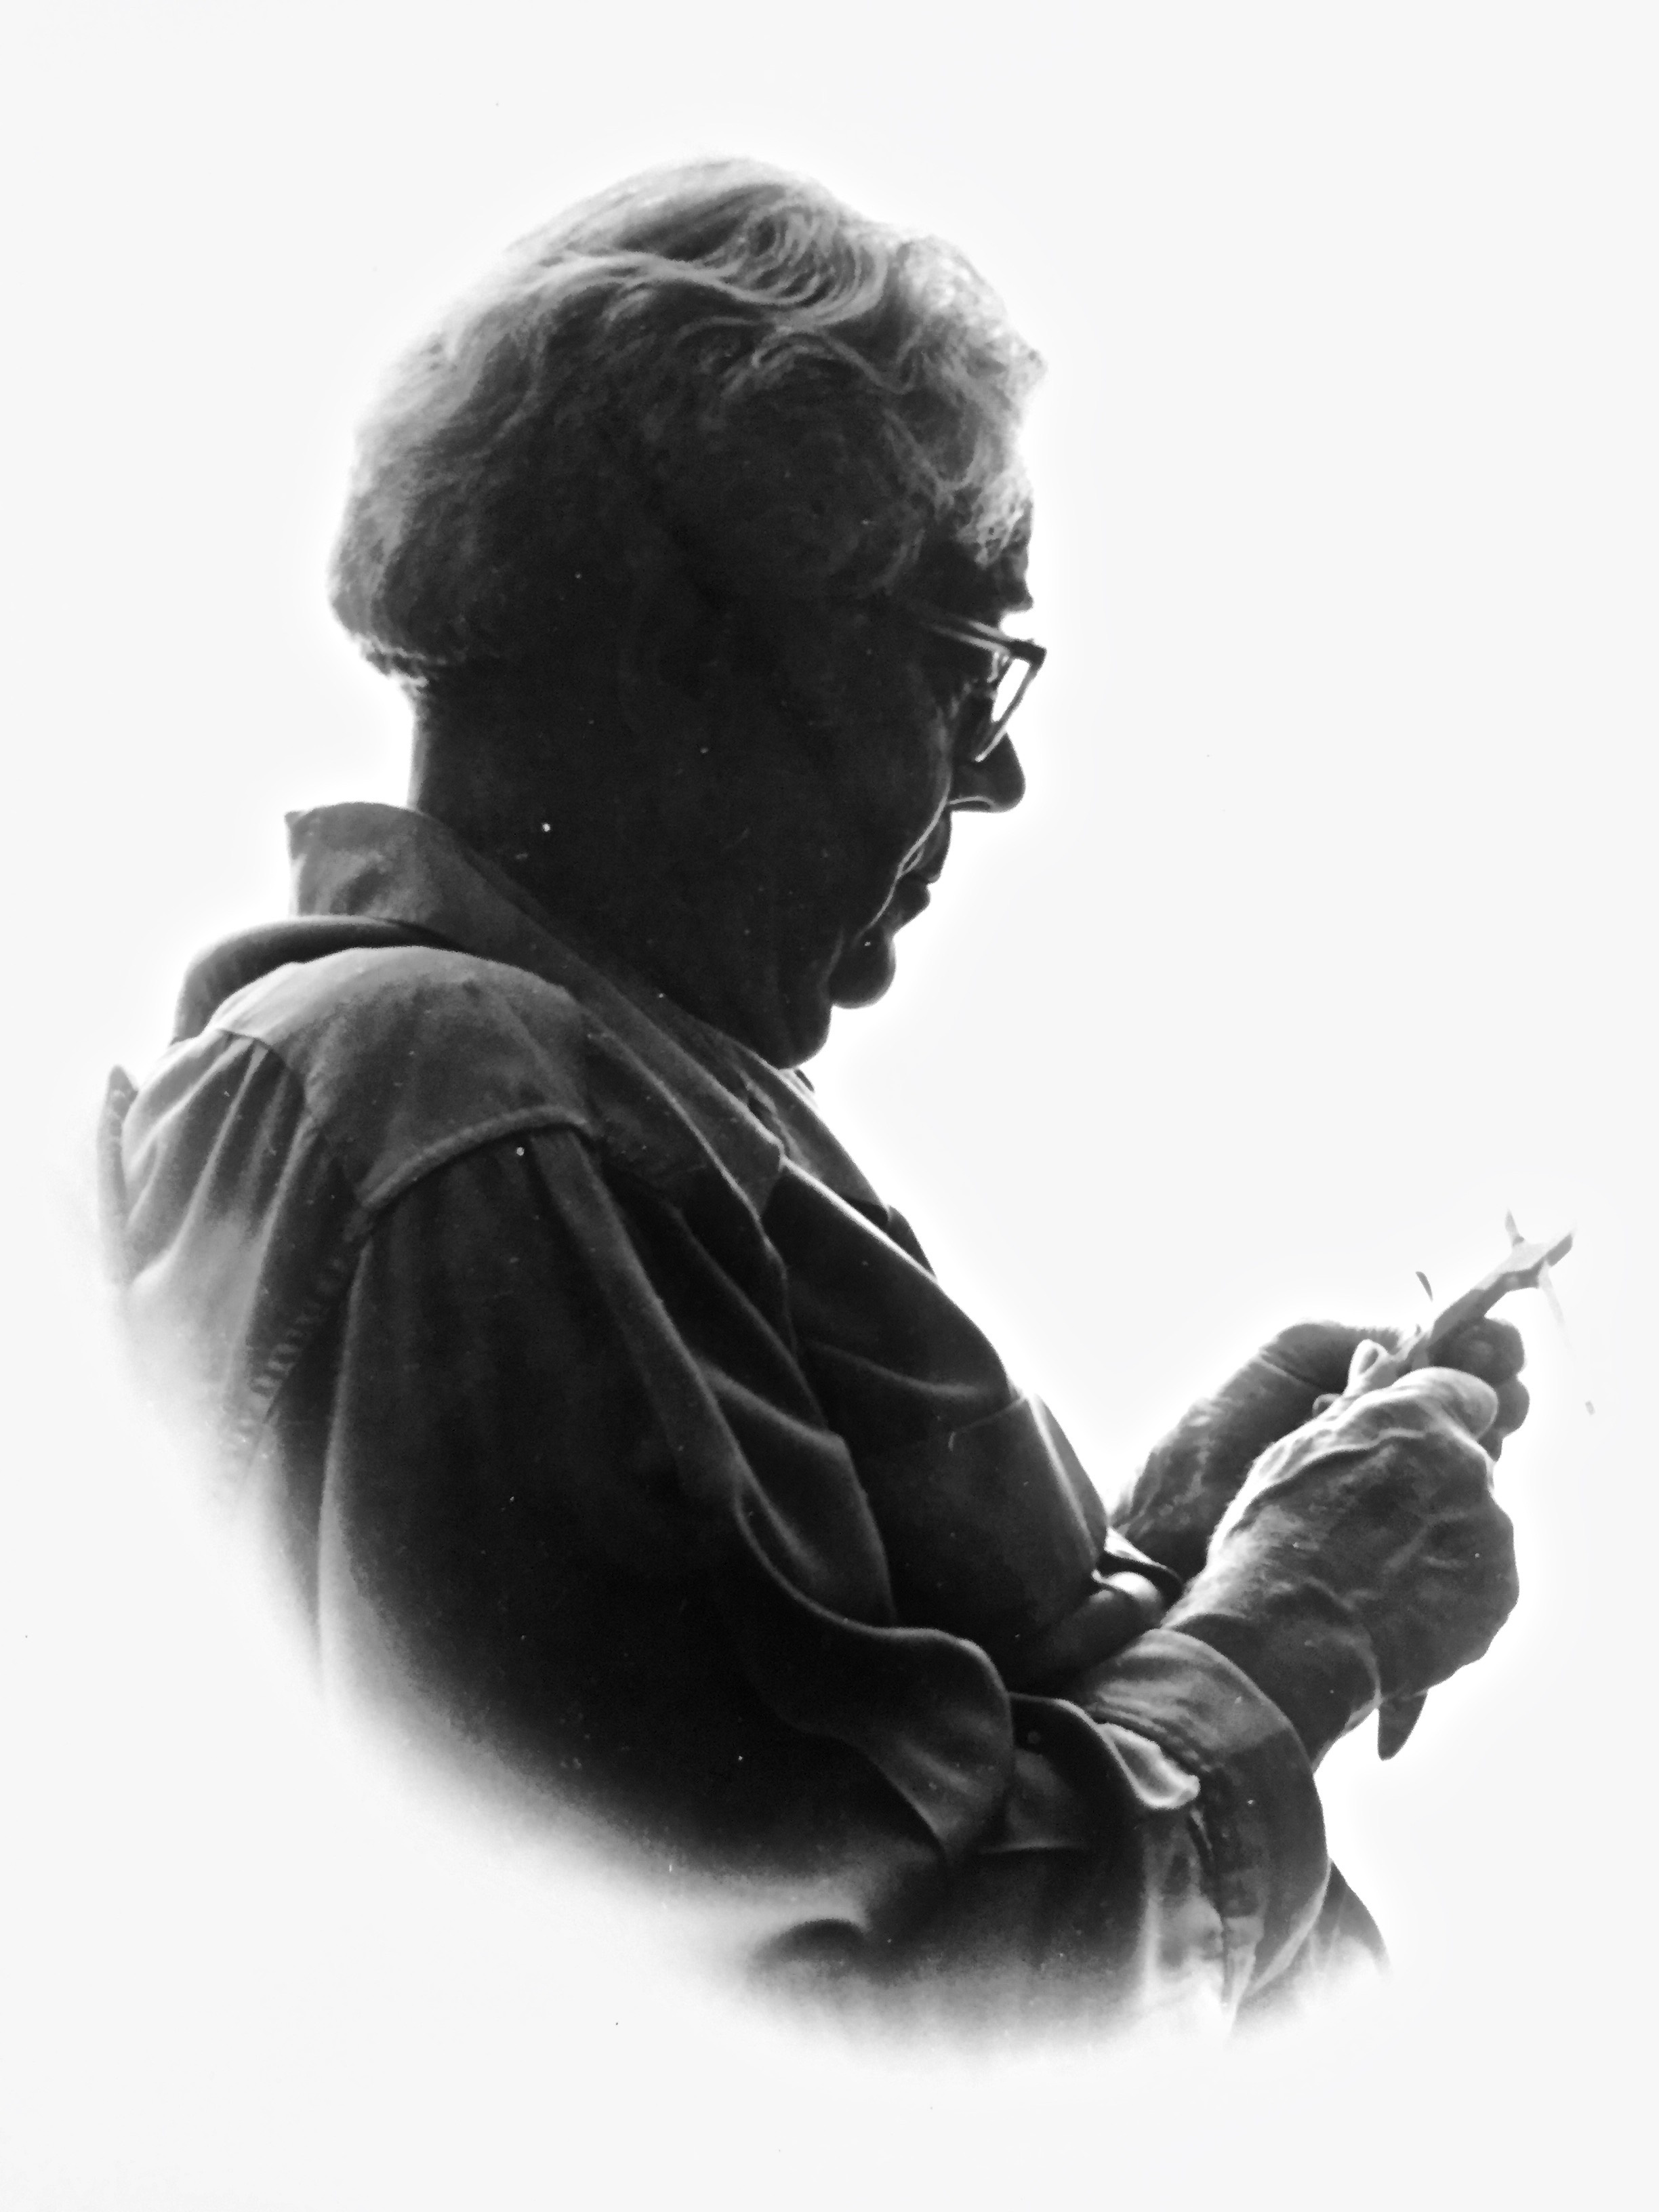 Museum Director - Carol (Warther) Moreland330-505-6003 Ext. 202carol@thewarthermuseum.com